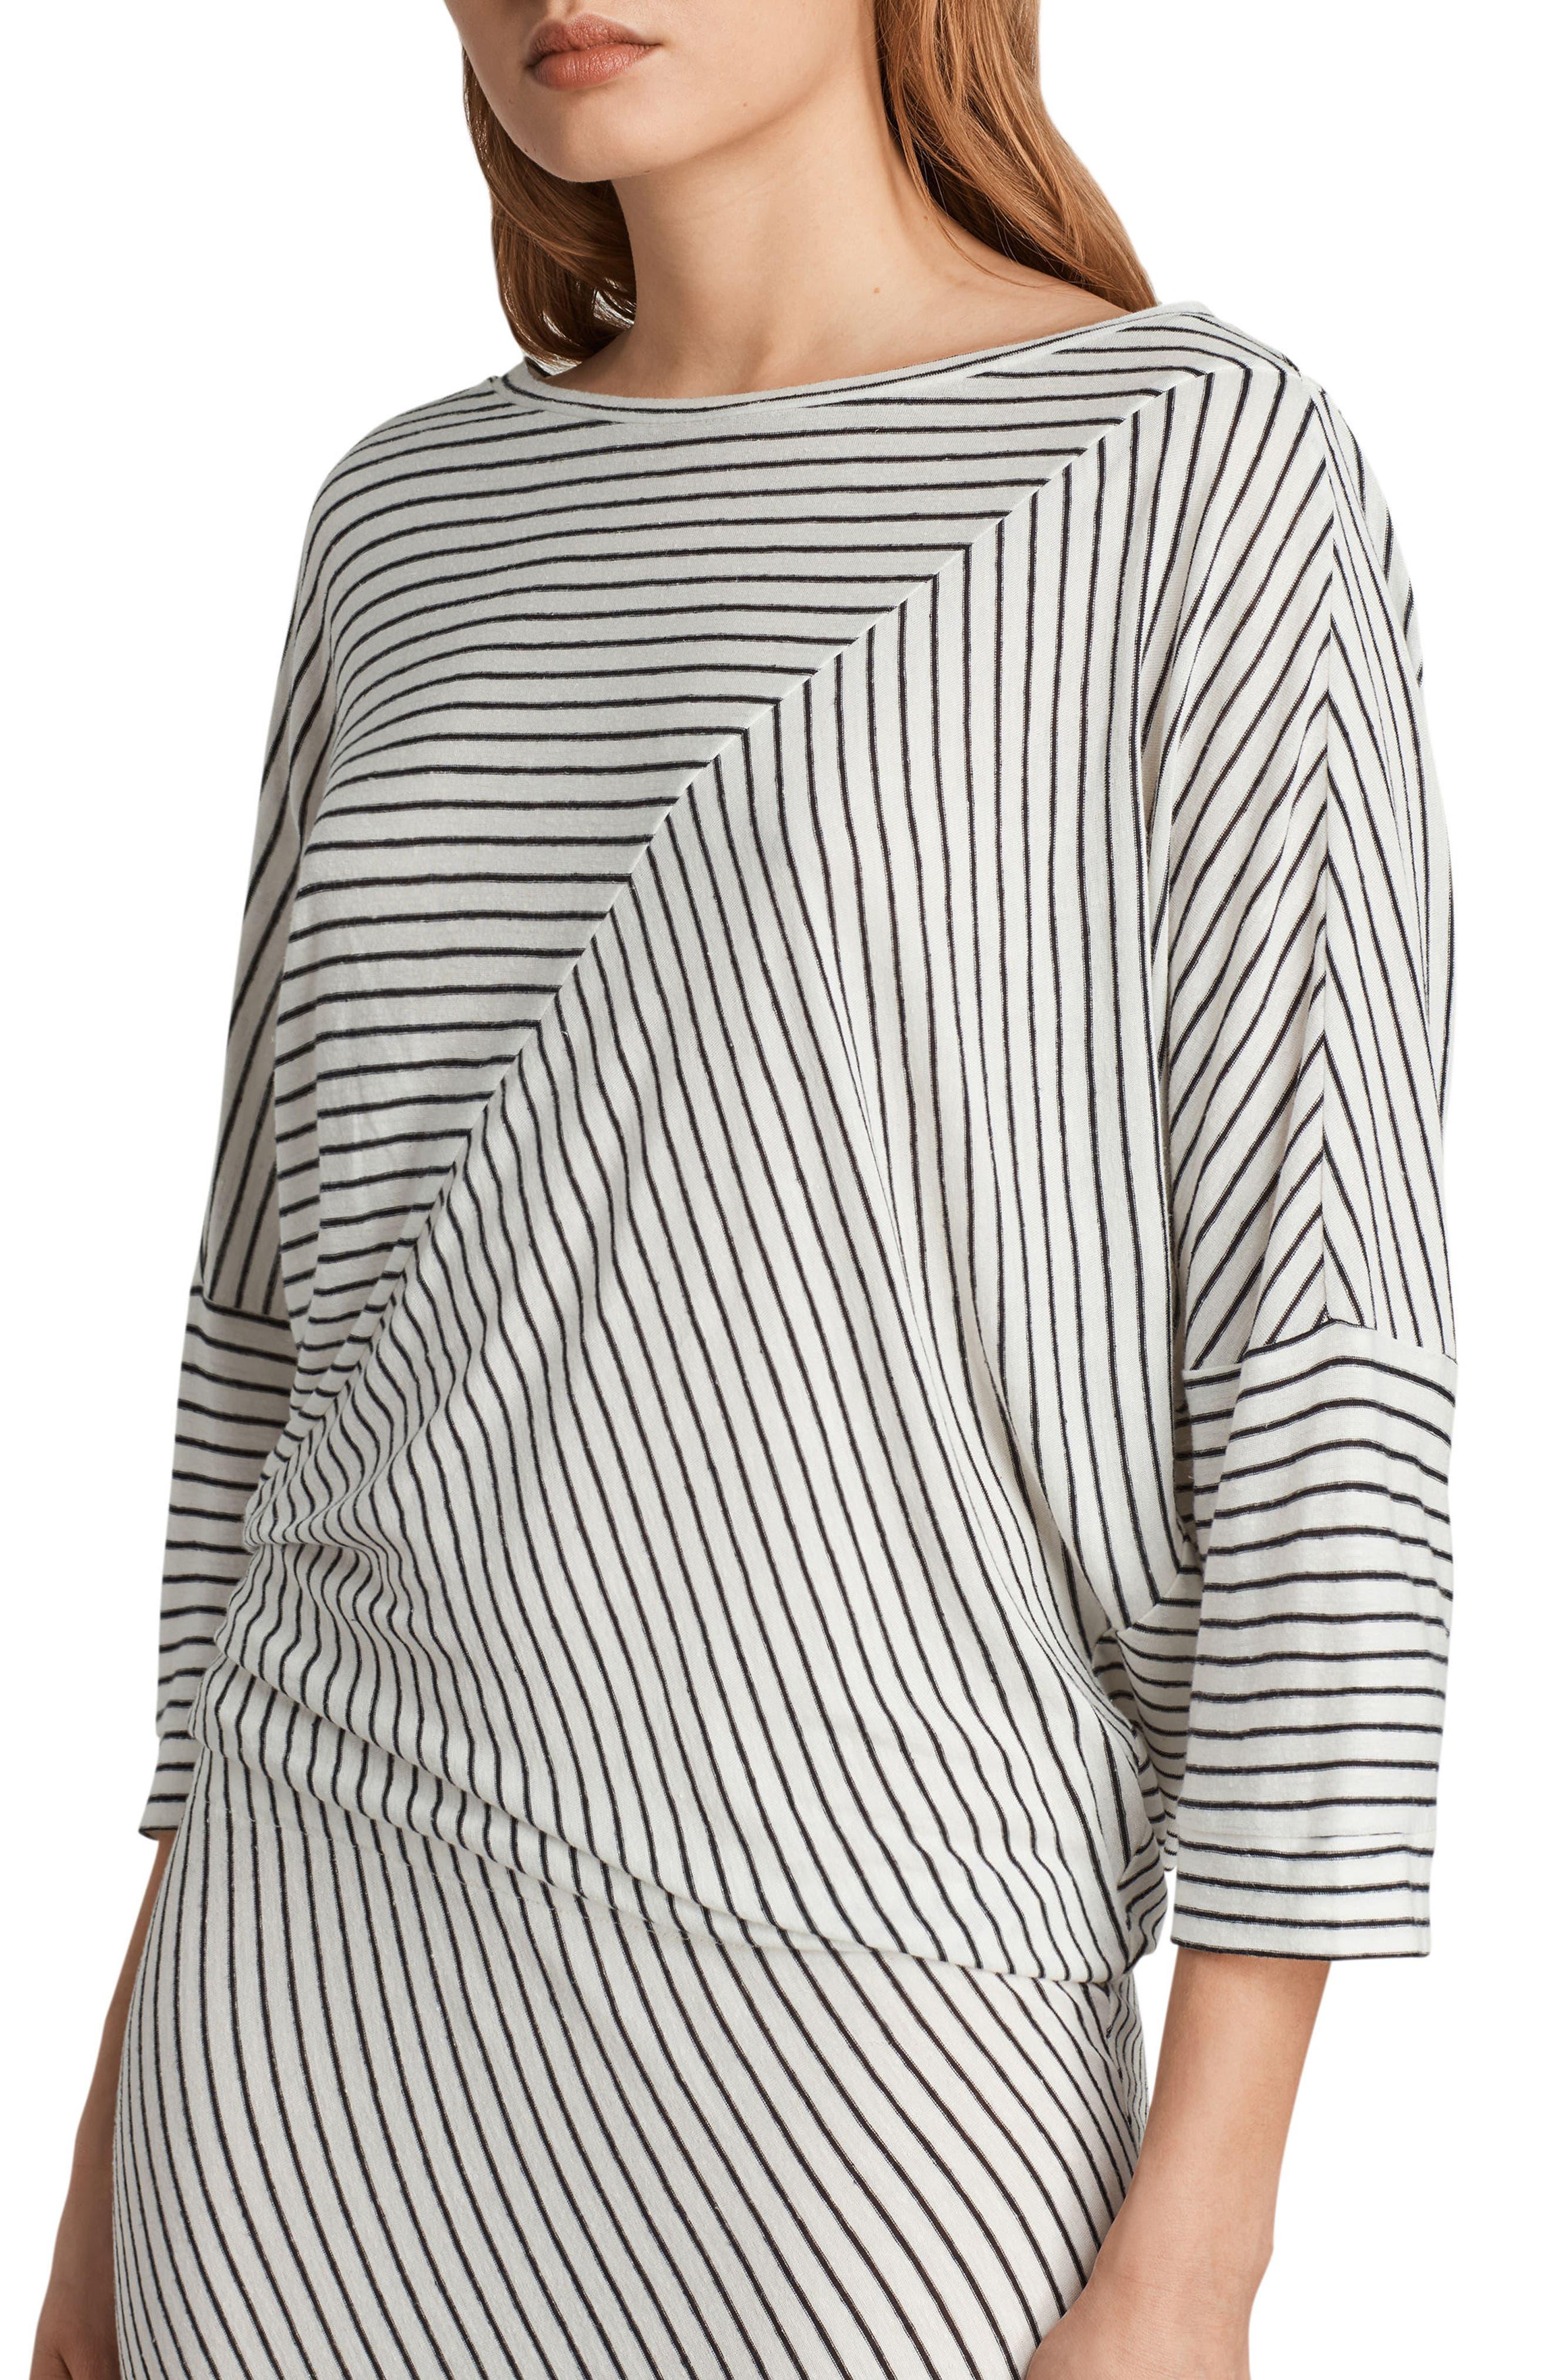 Cadie Stripe Midi Dress,                             Alternate thumbnail 4, color,                             Ecru White/ Black